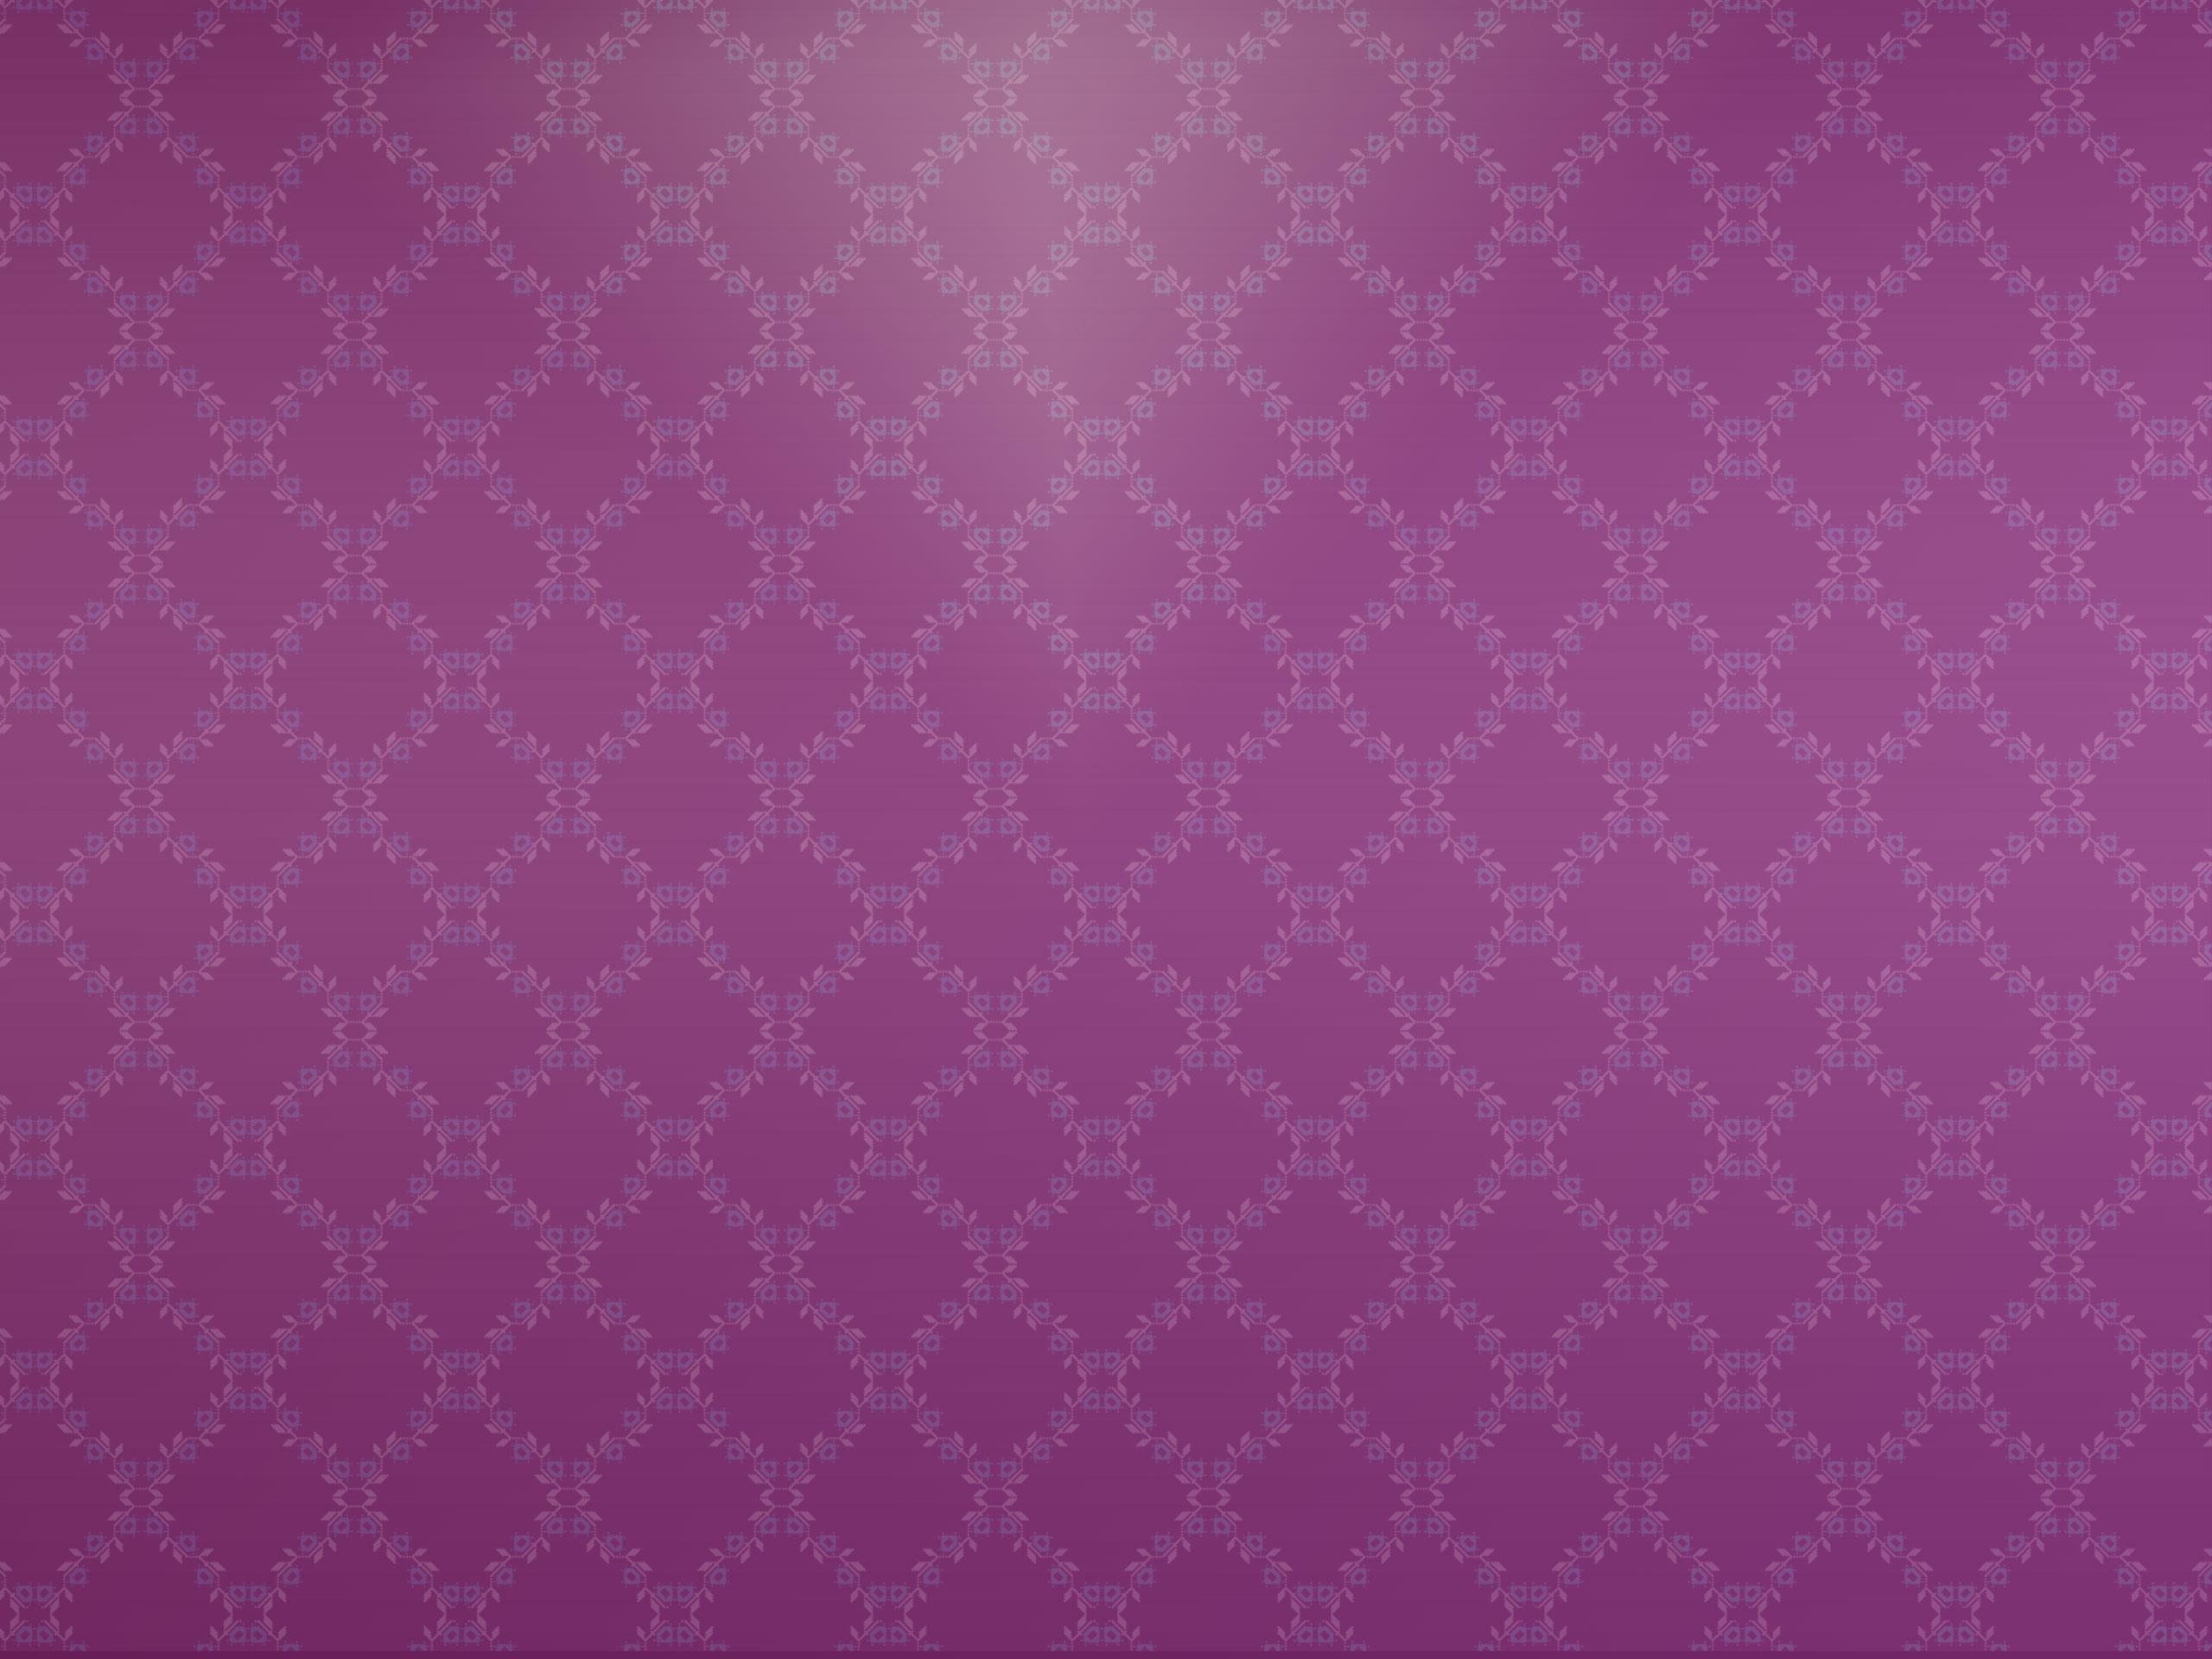 Purple seamless pattern backgrounds | www.vectorfantasy.com